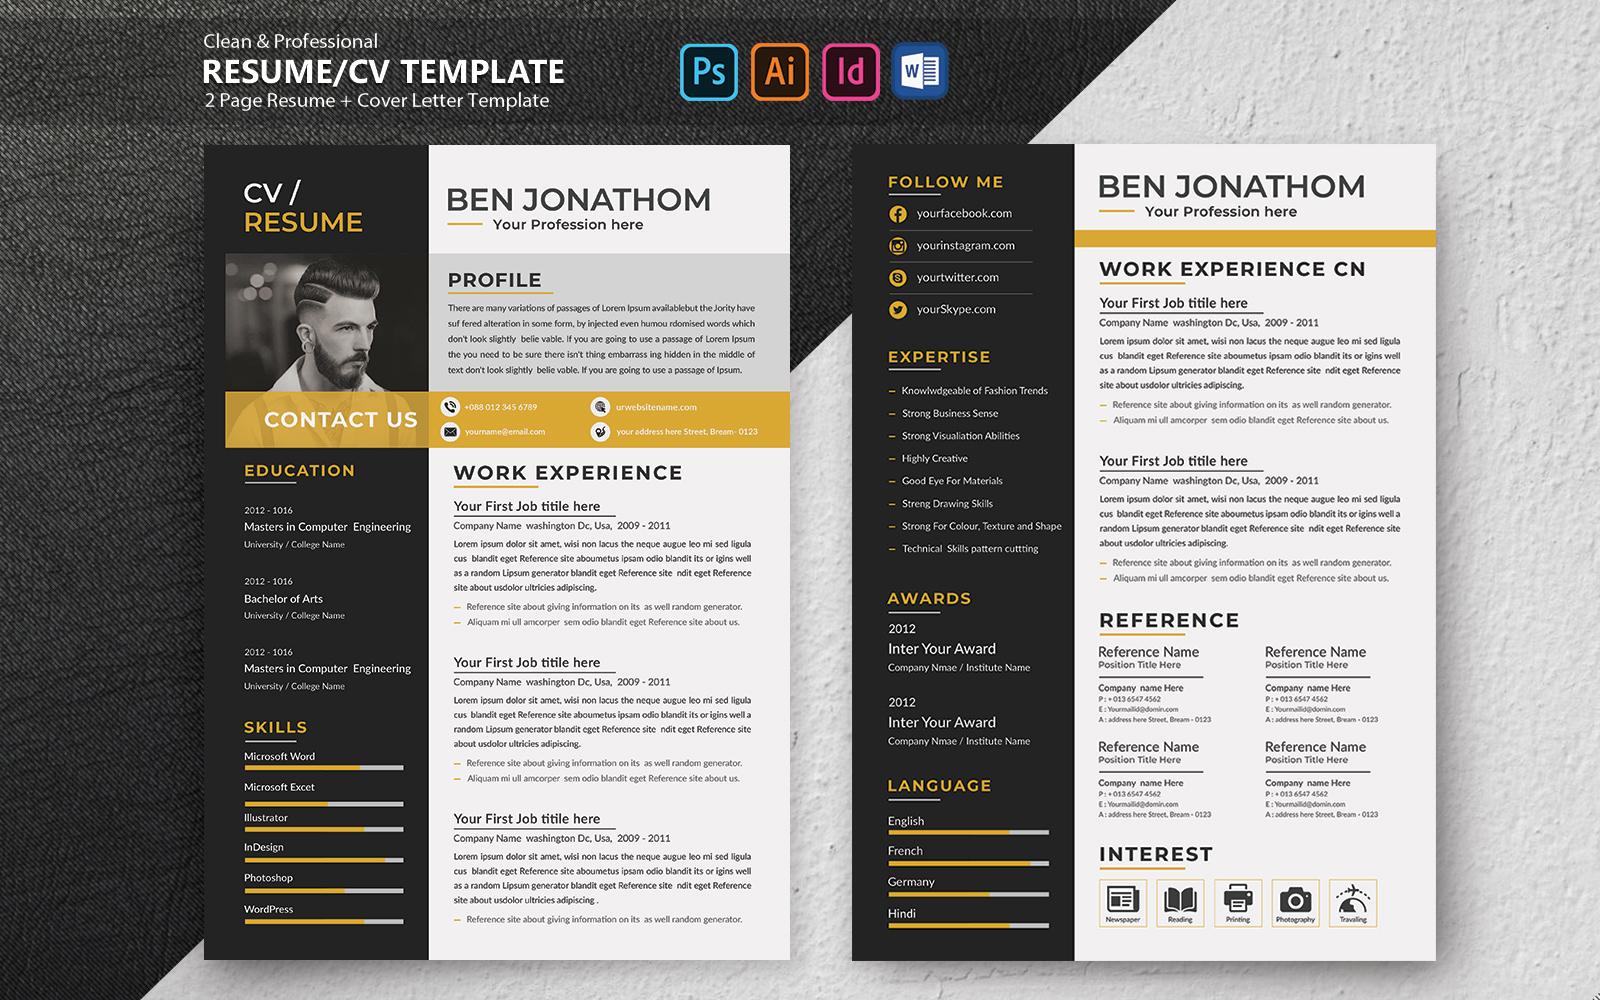 Modarn and Creative Ben Jonathom Resume #102092